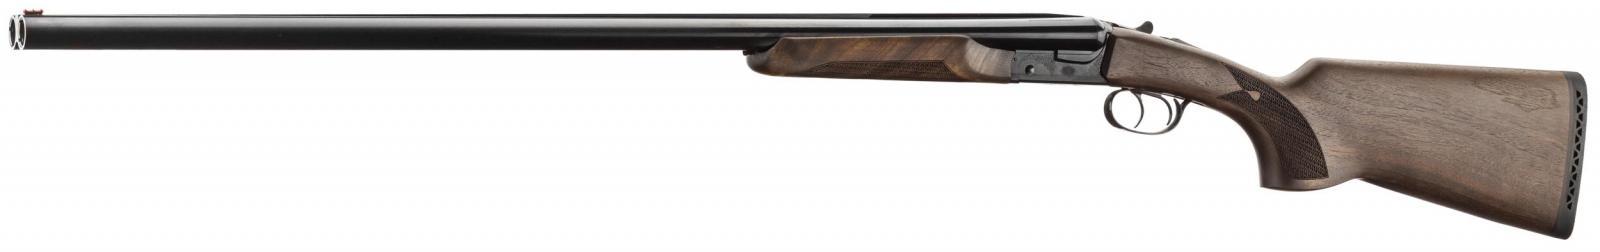 Fusil juxtaposés RENATO BALDI Canardouze Cal .12/89